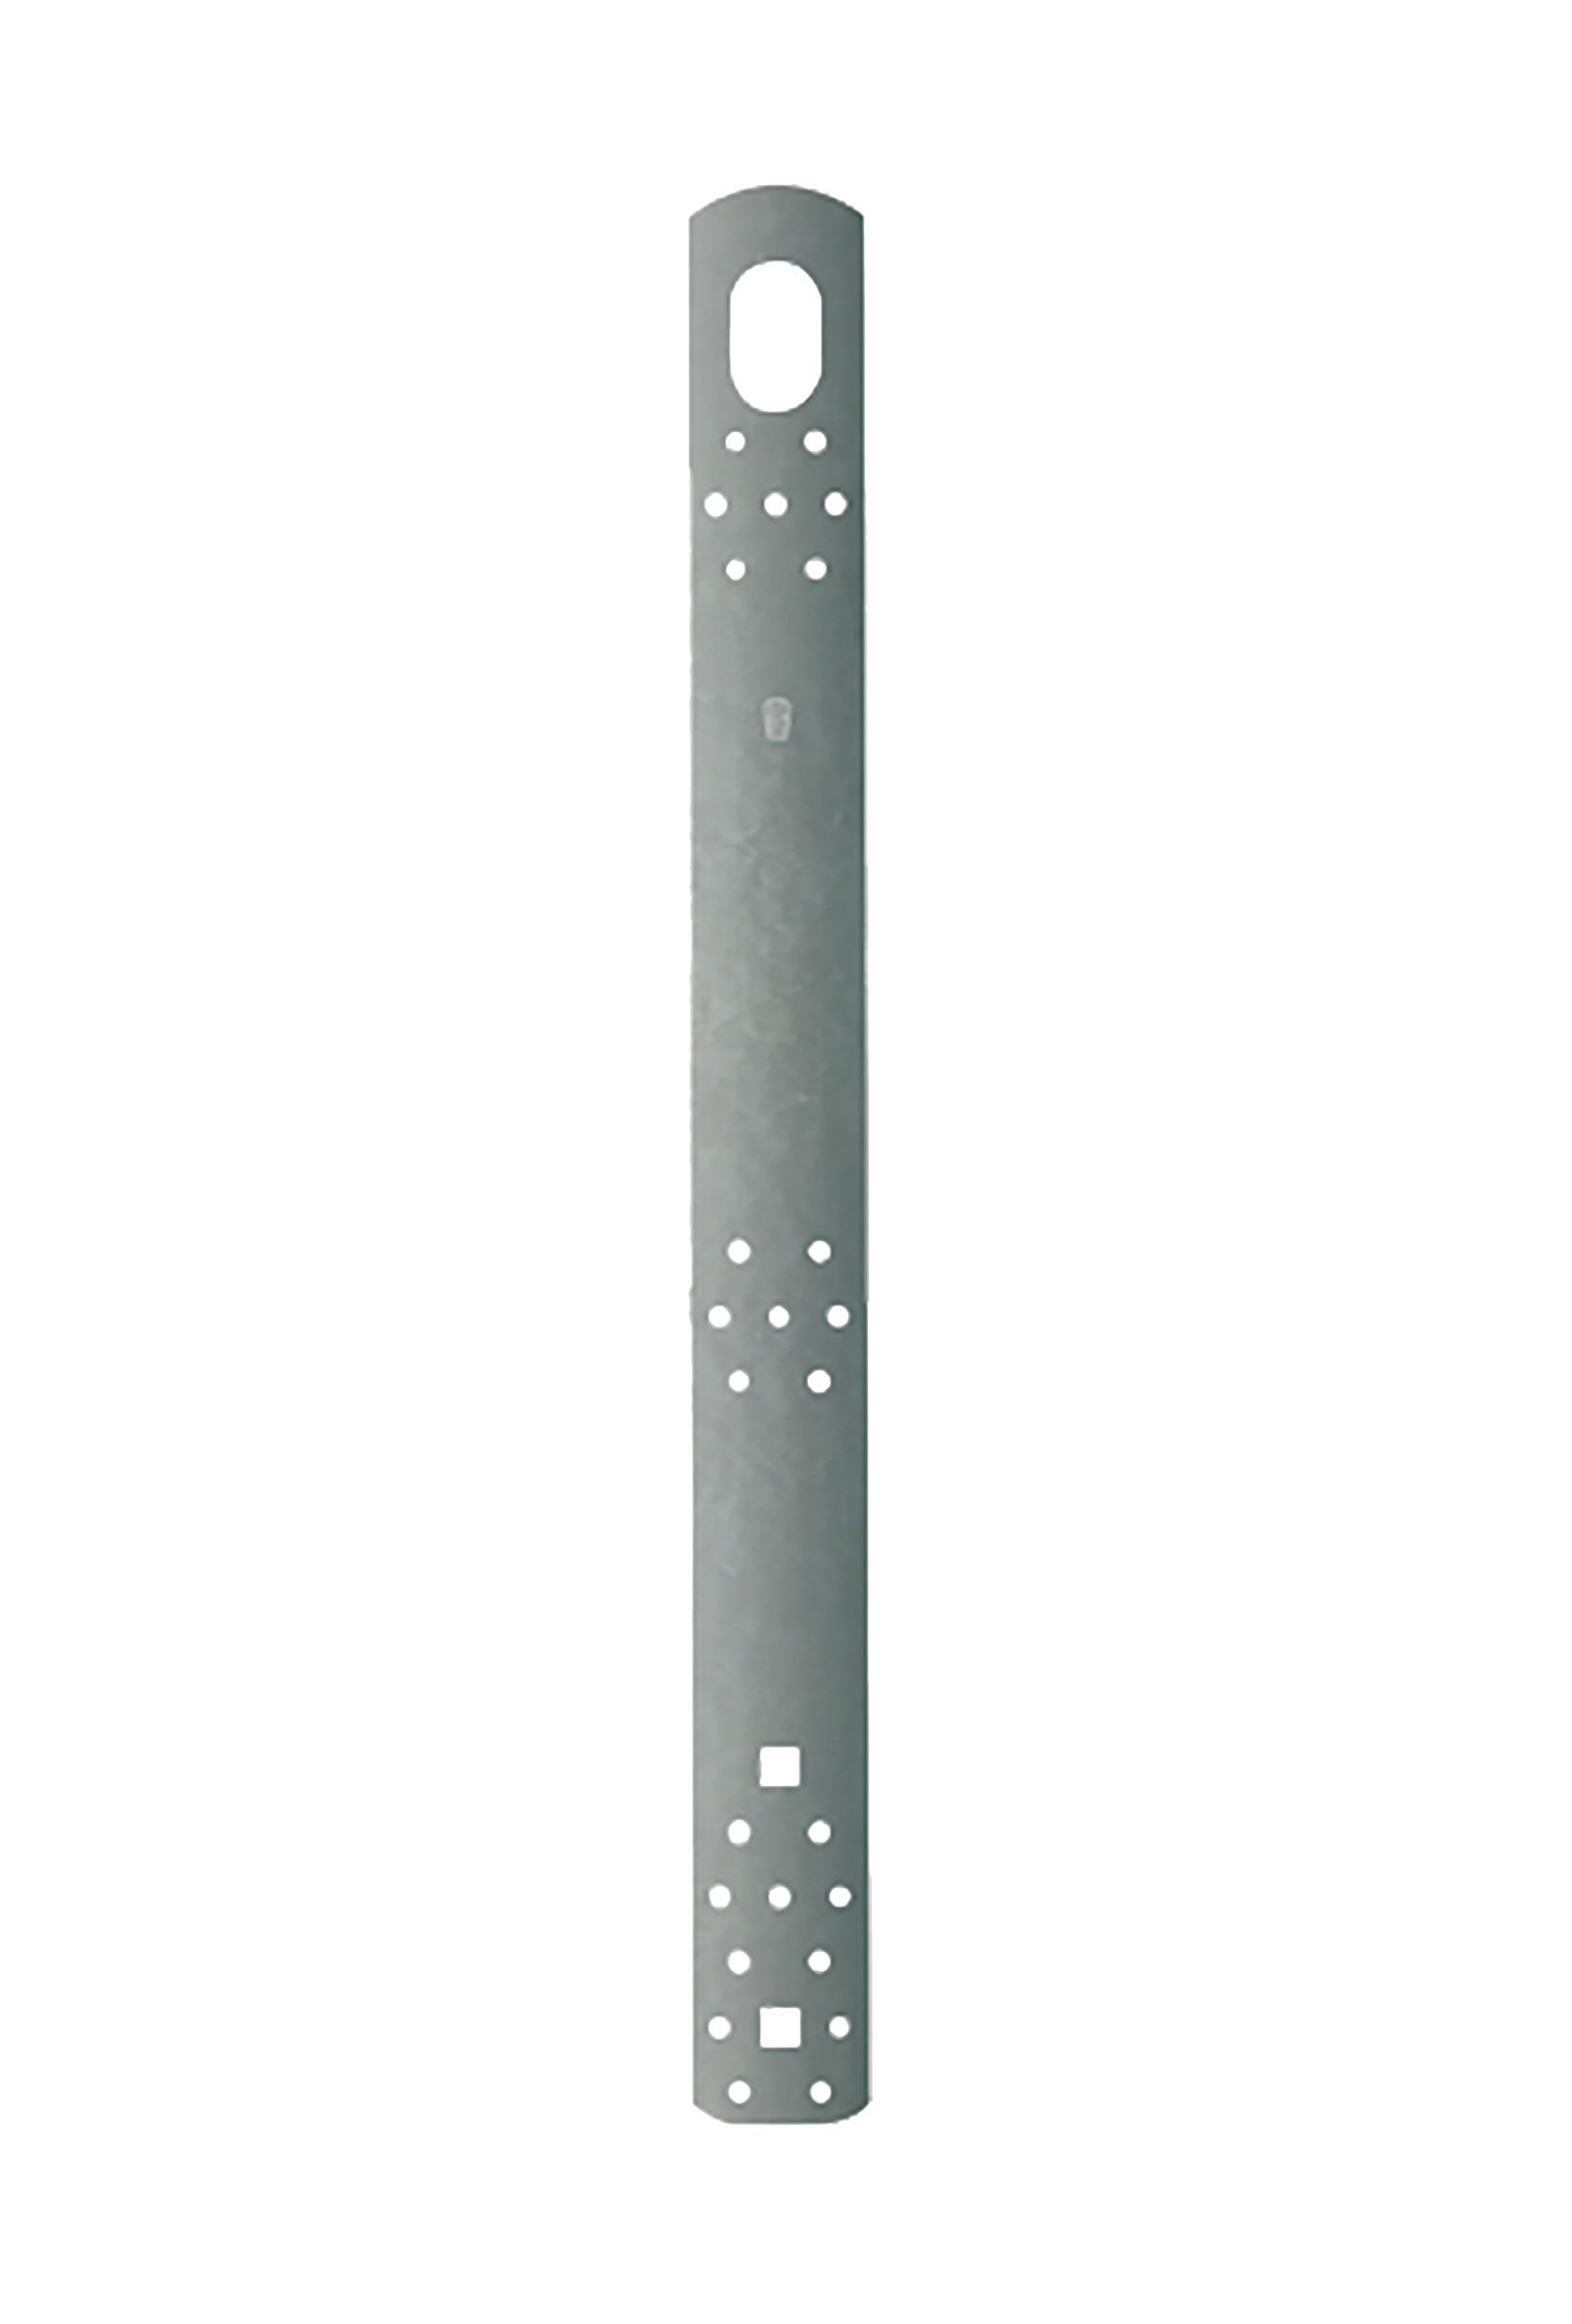 Hijsoog 600 57x2 SV